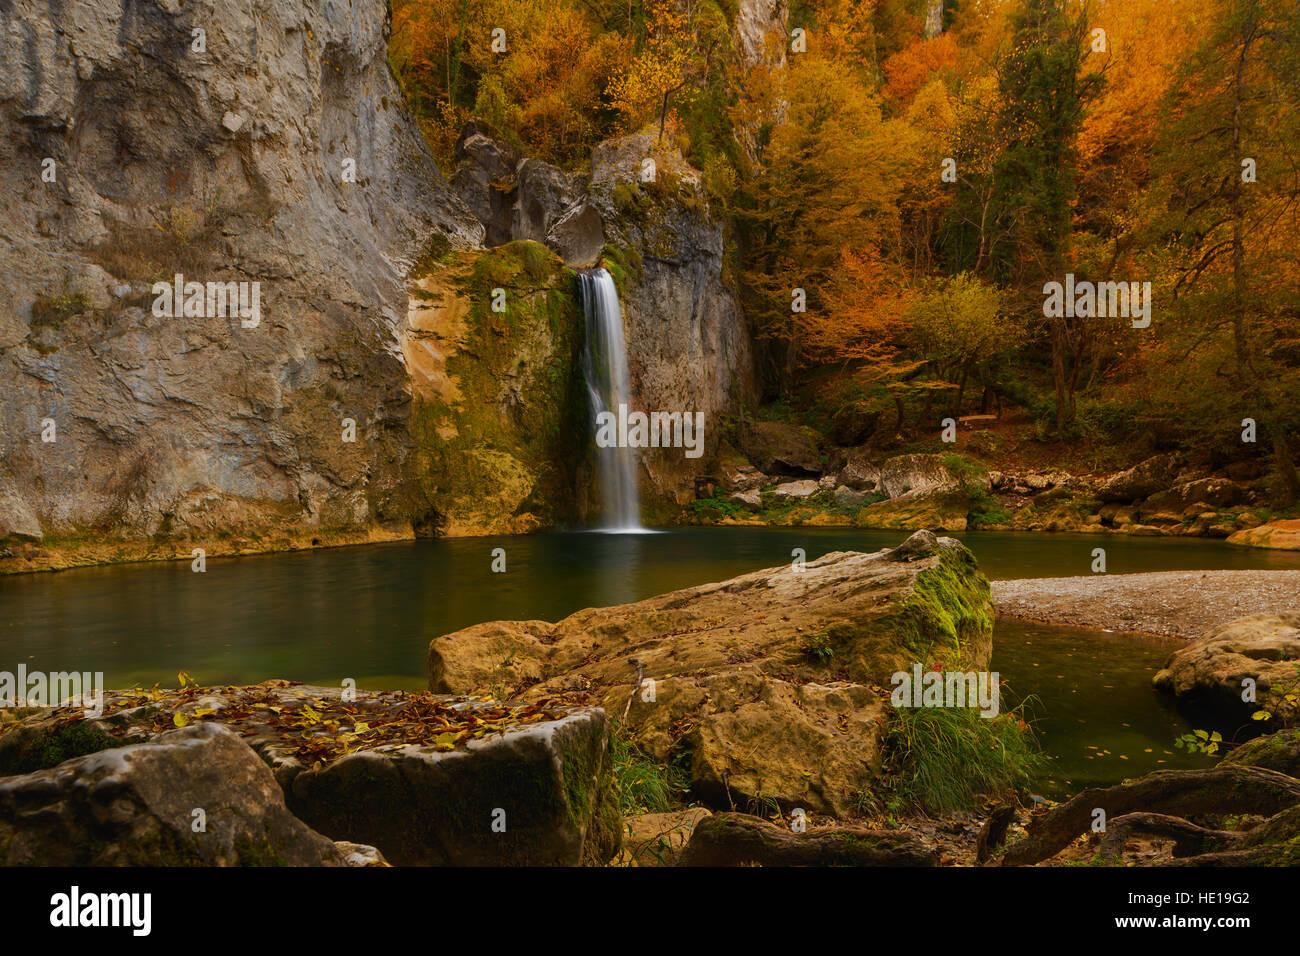 Paisaje de Ilica cascada con hermosa naturaleza otoño de Kure montañas en Kastamonu, Turquía Imagen De Stock